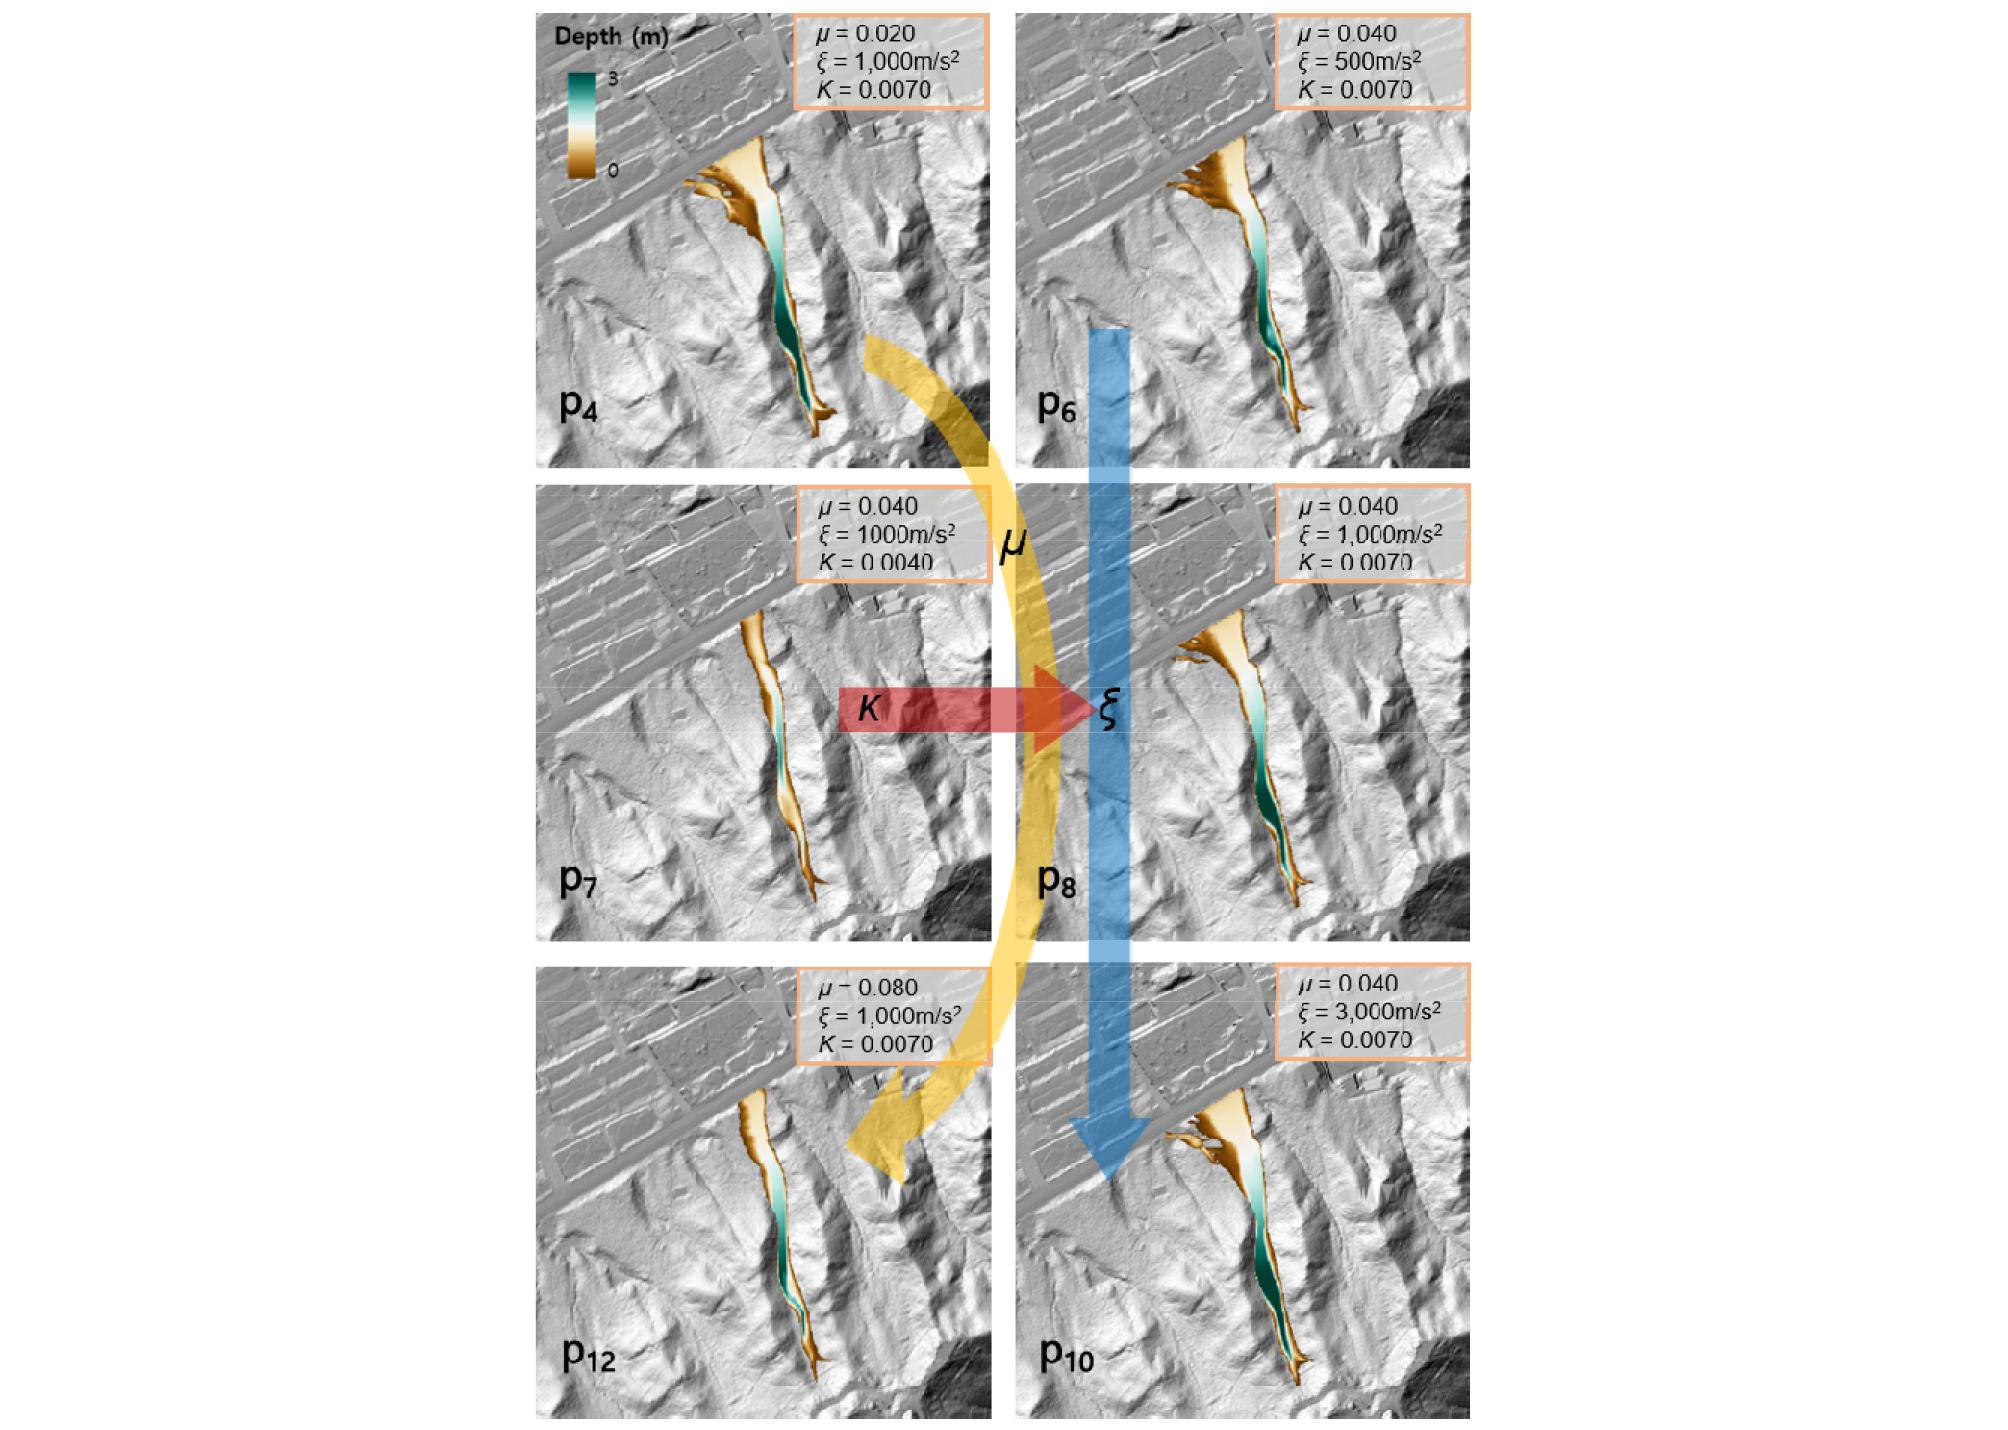 http://static.apub.kr/journalsite/sites/kwra/2020-053-09/N0200530901/images/kwra_53_09_01_F5.jpg